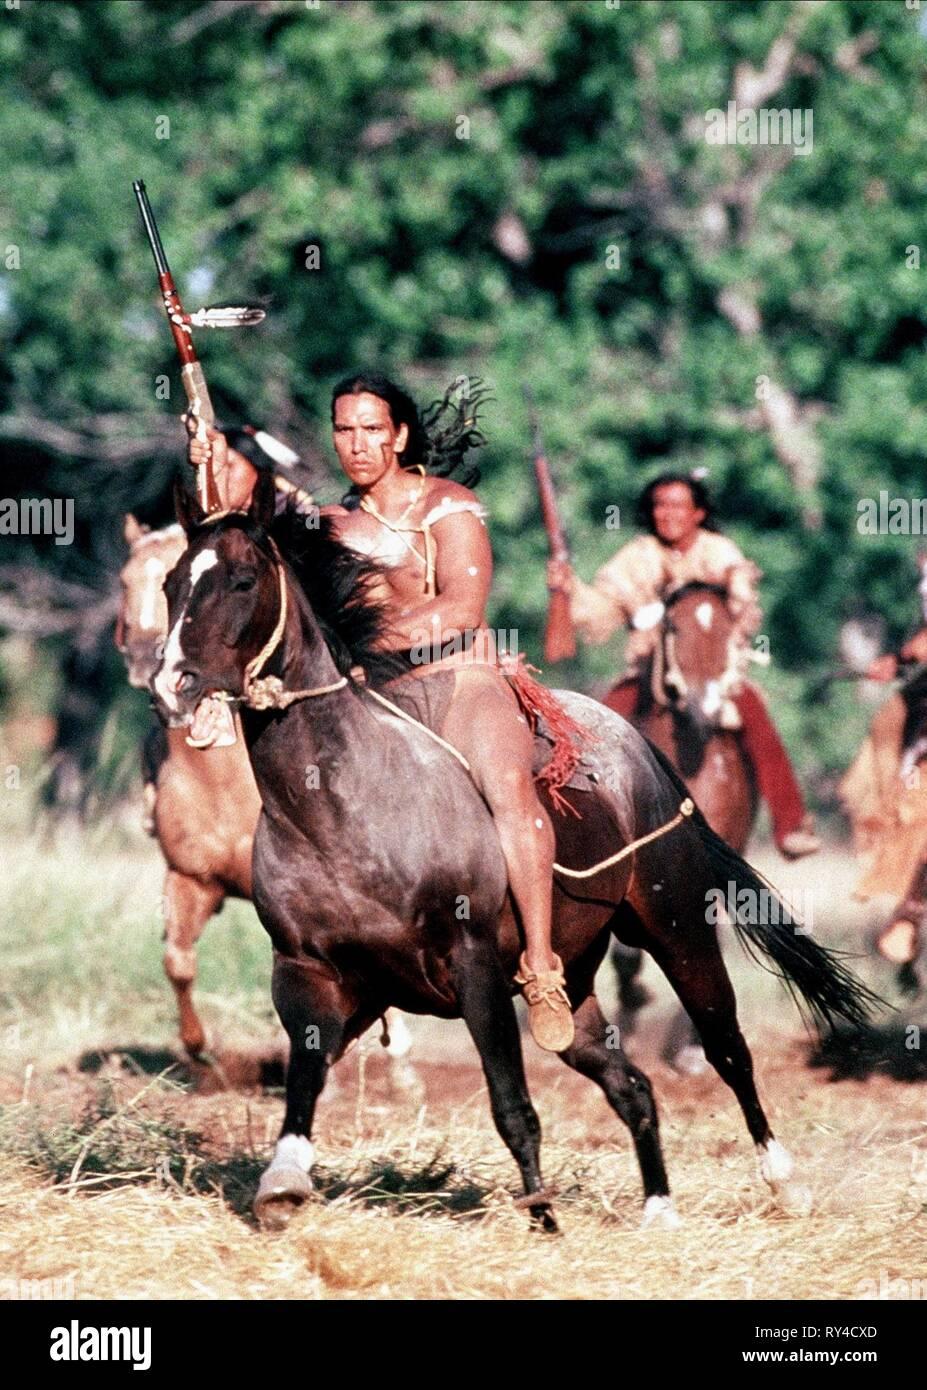 Crazy Horse Stock Photos & Crazy Horse Stock Images - Alamy